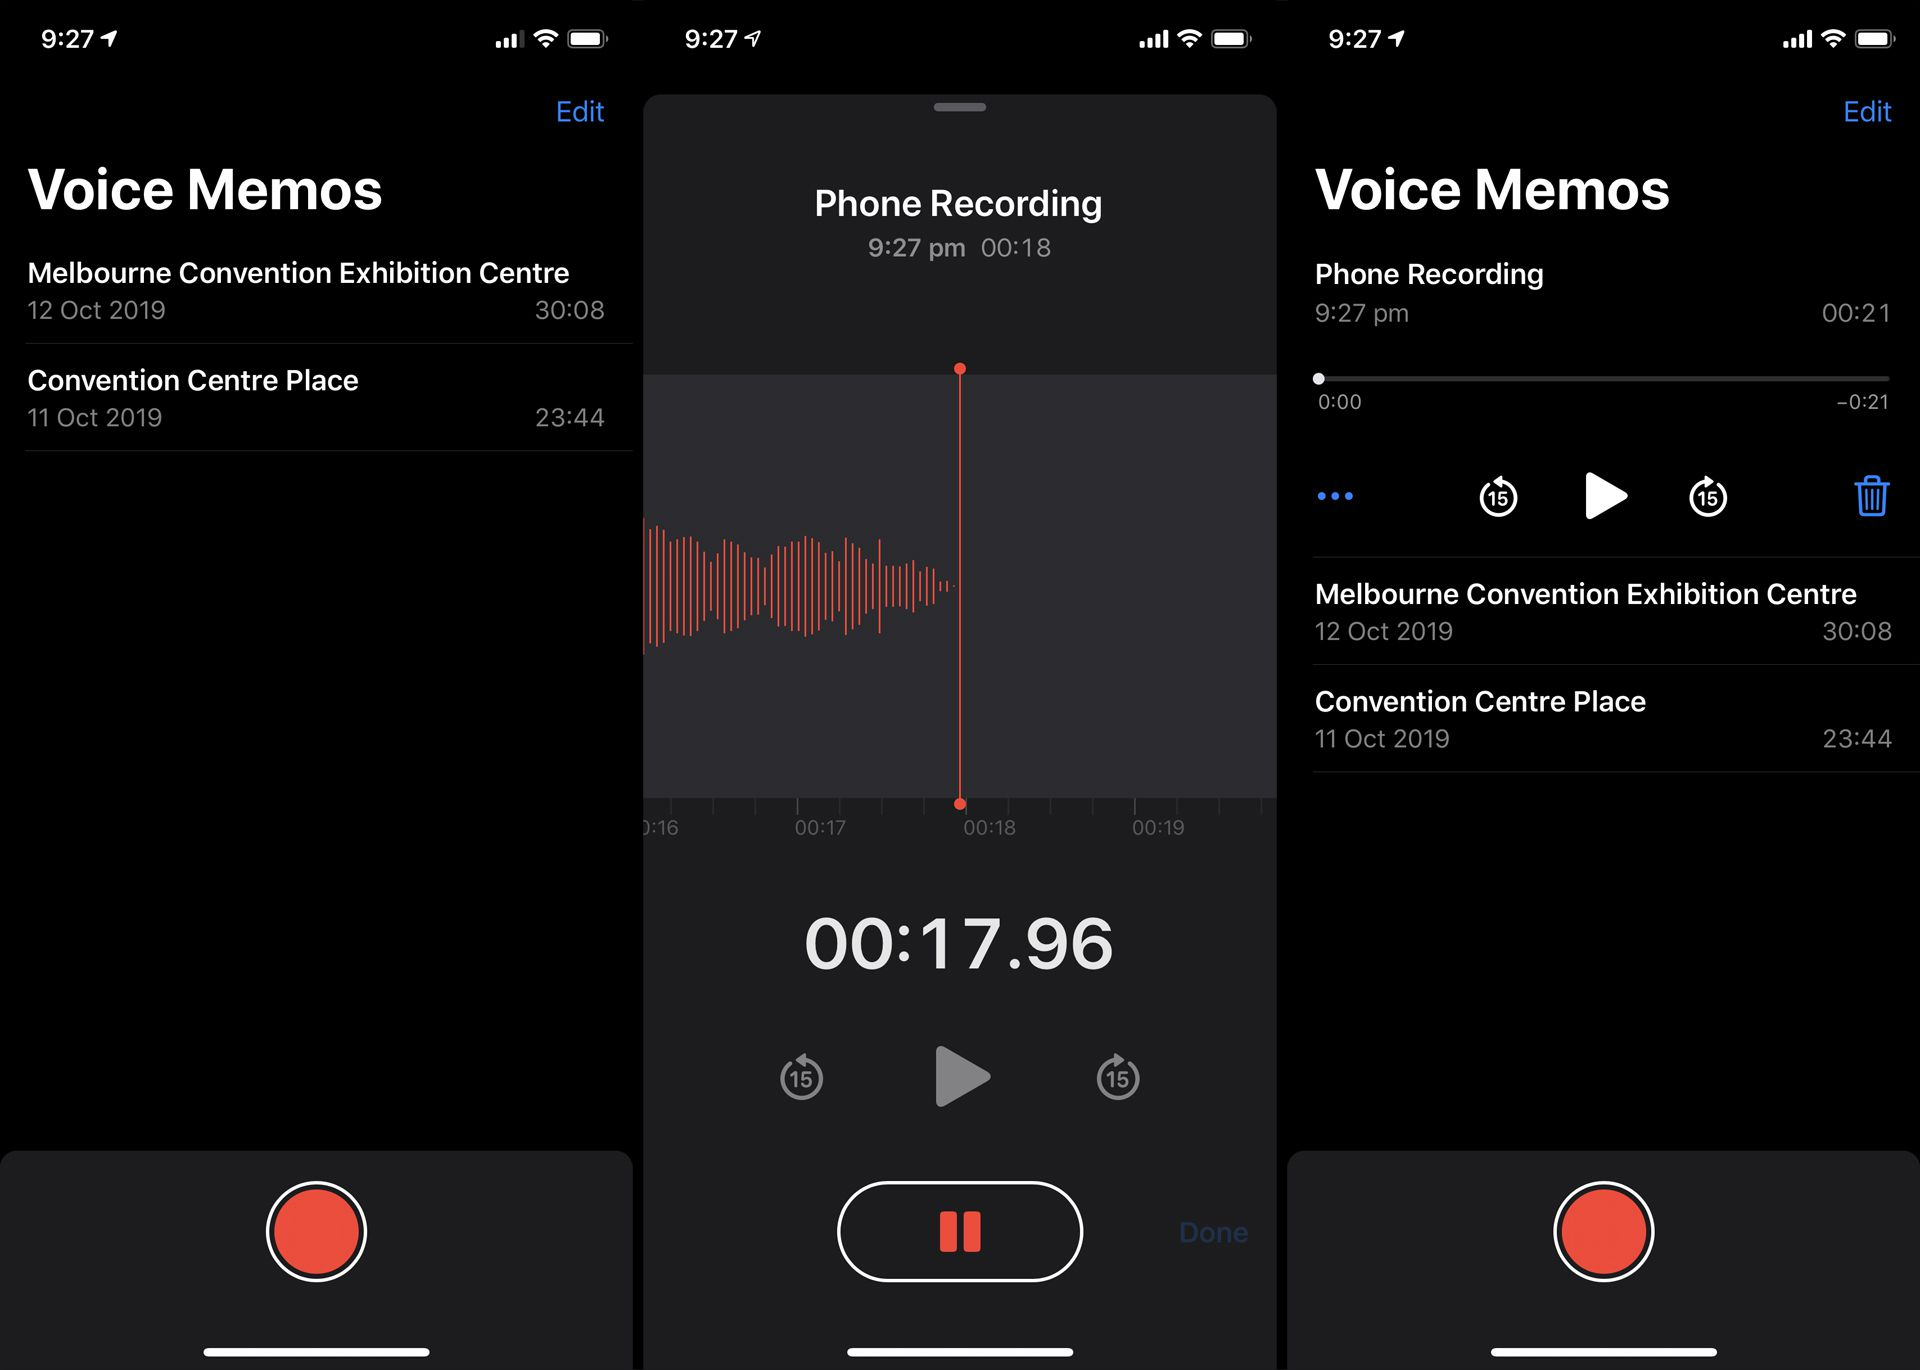 Apple's Voice Memos app recording a phone call.